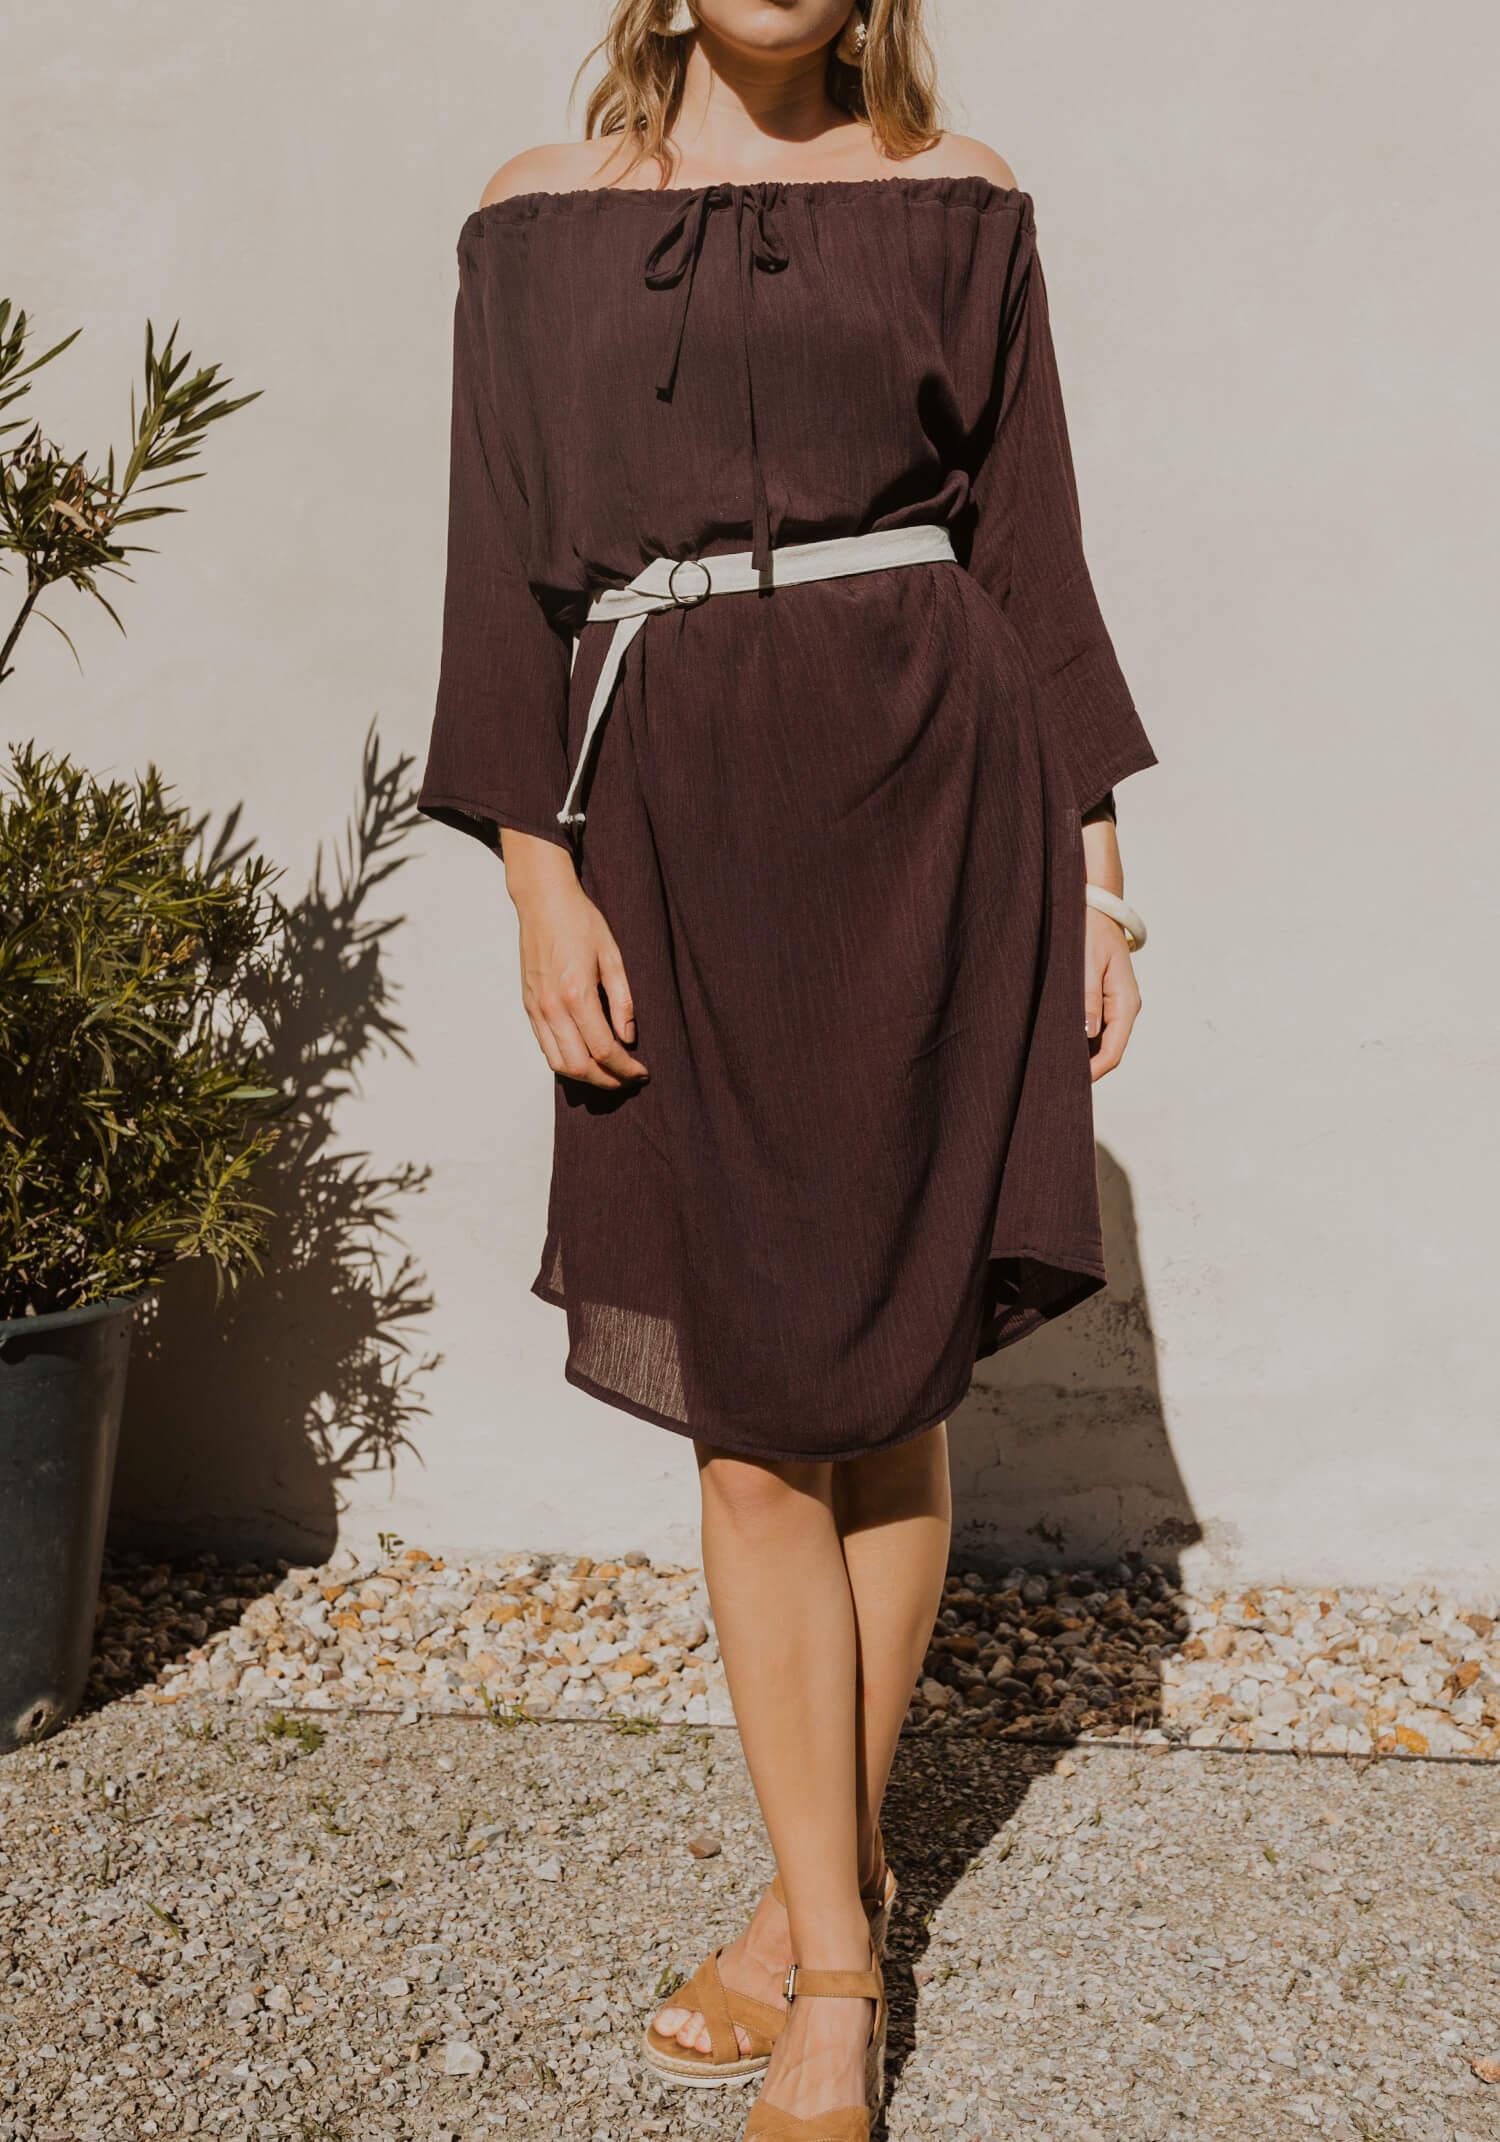 Off the shoulder versatile slow fashion Dress Prague